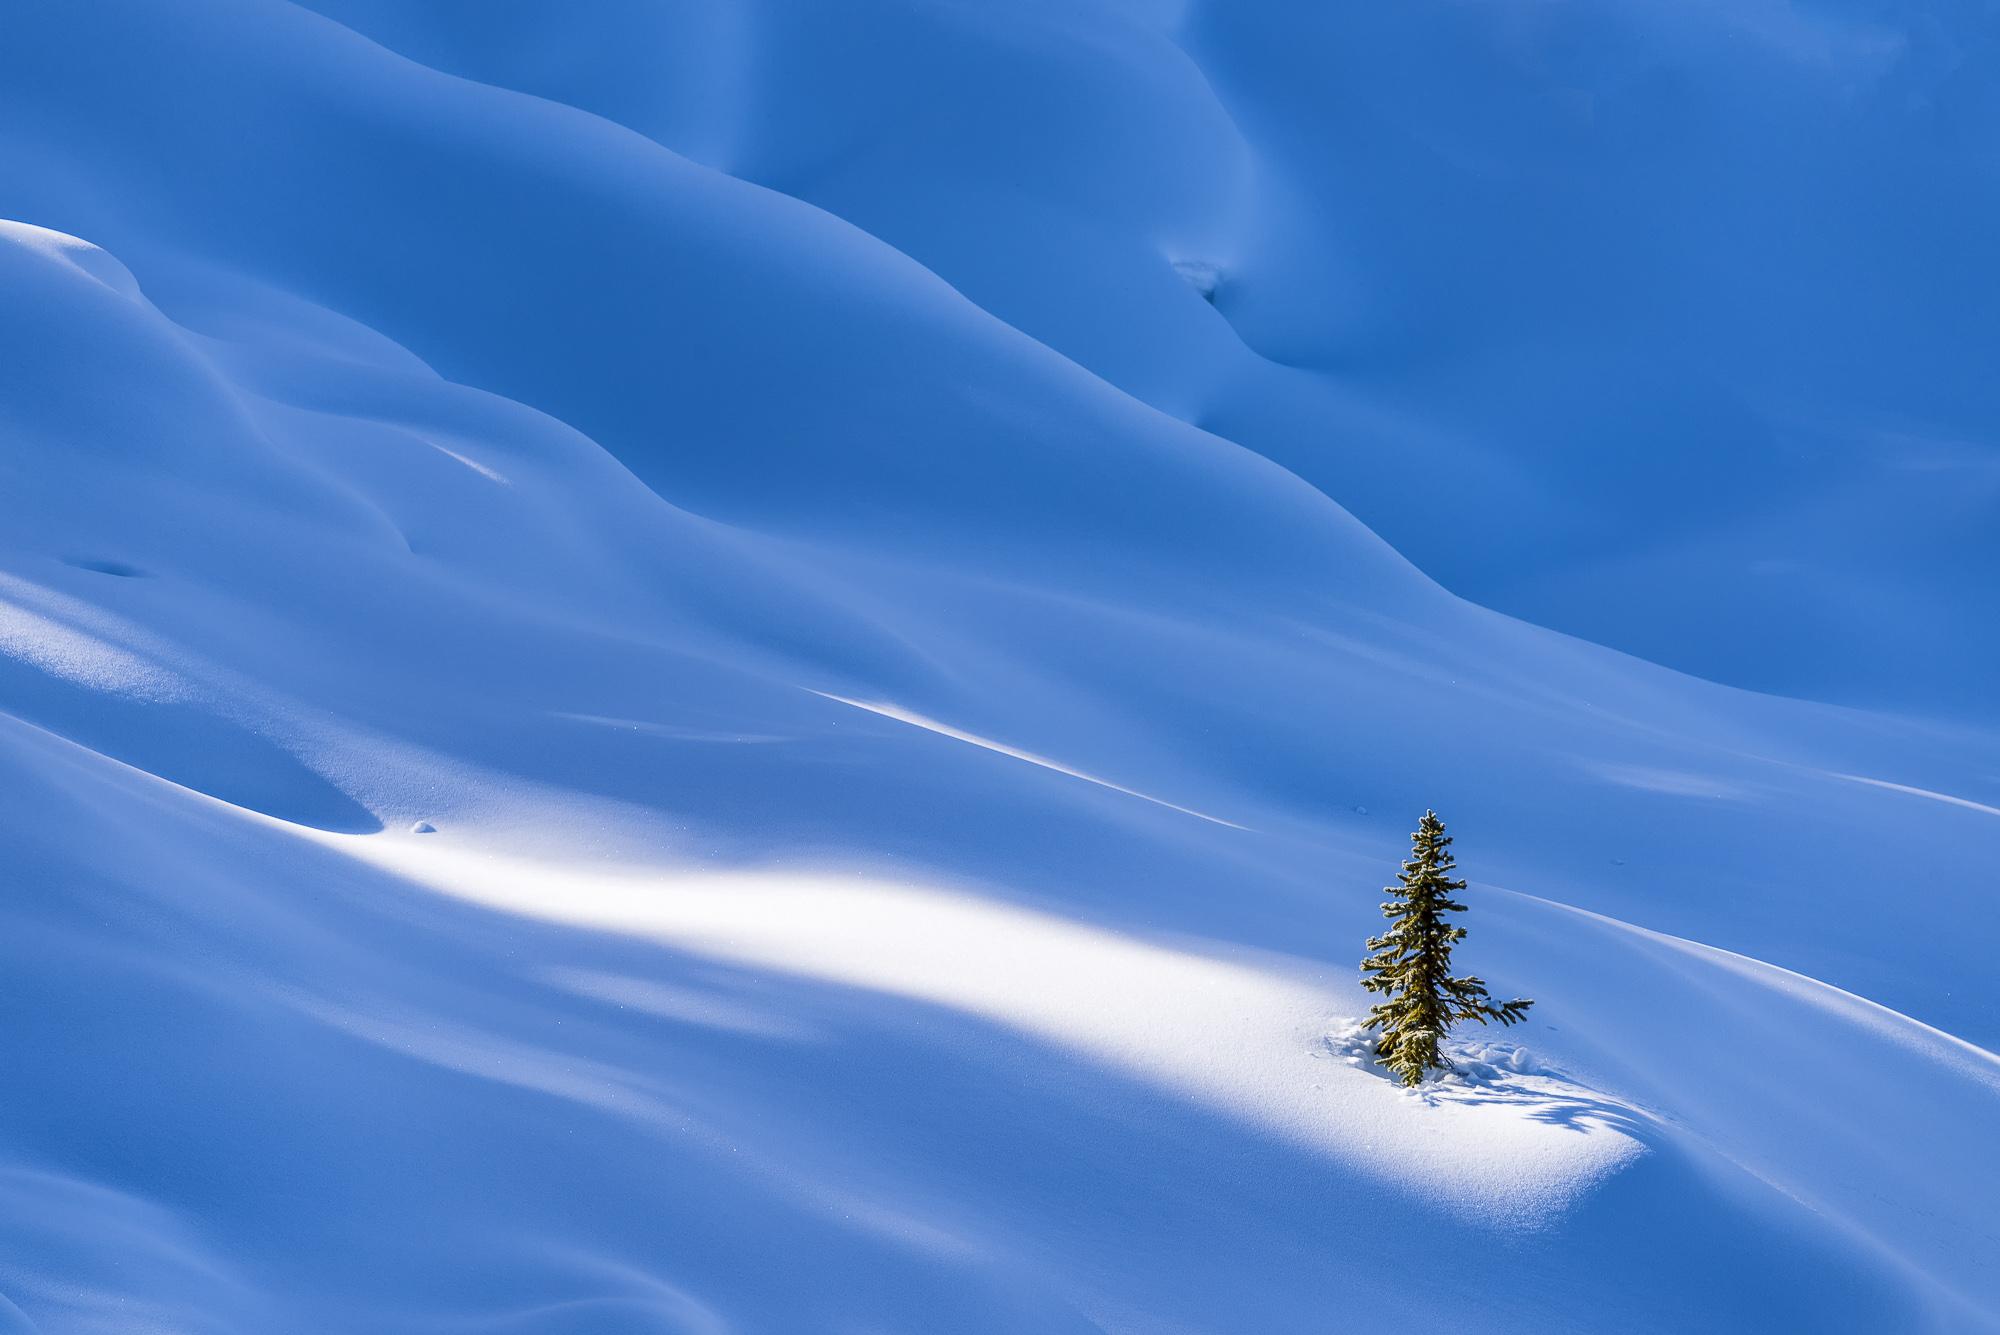 Single Pine Tree in Winter, Banff National Park, Aberta, Canada